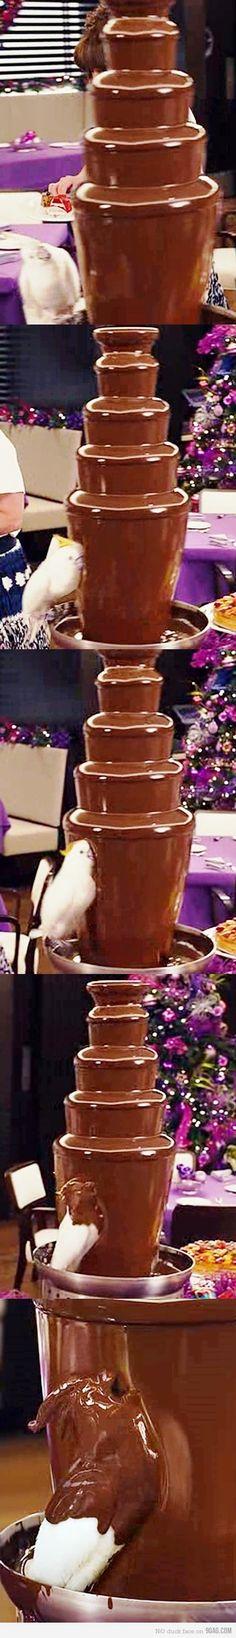 parrot's chocolate addiction